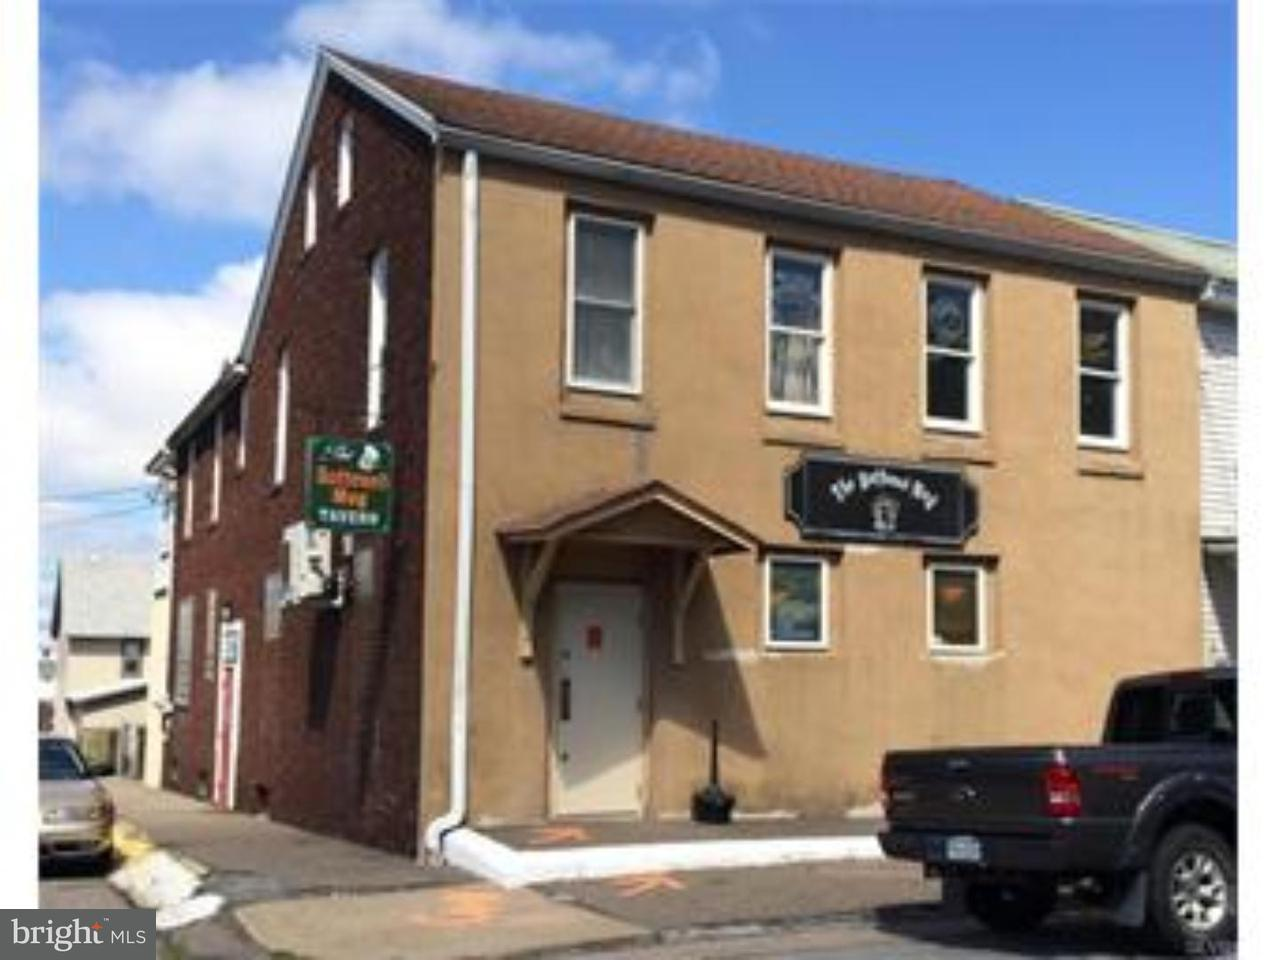 Single Family Home for Sale at 178 S PINE Street Hazleton, Pennsylvania 18201 United States